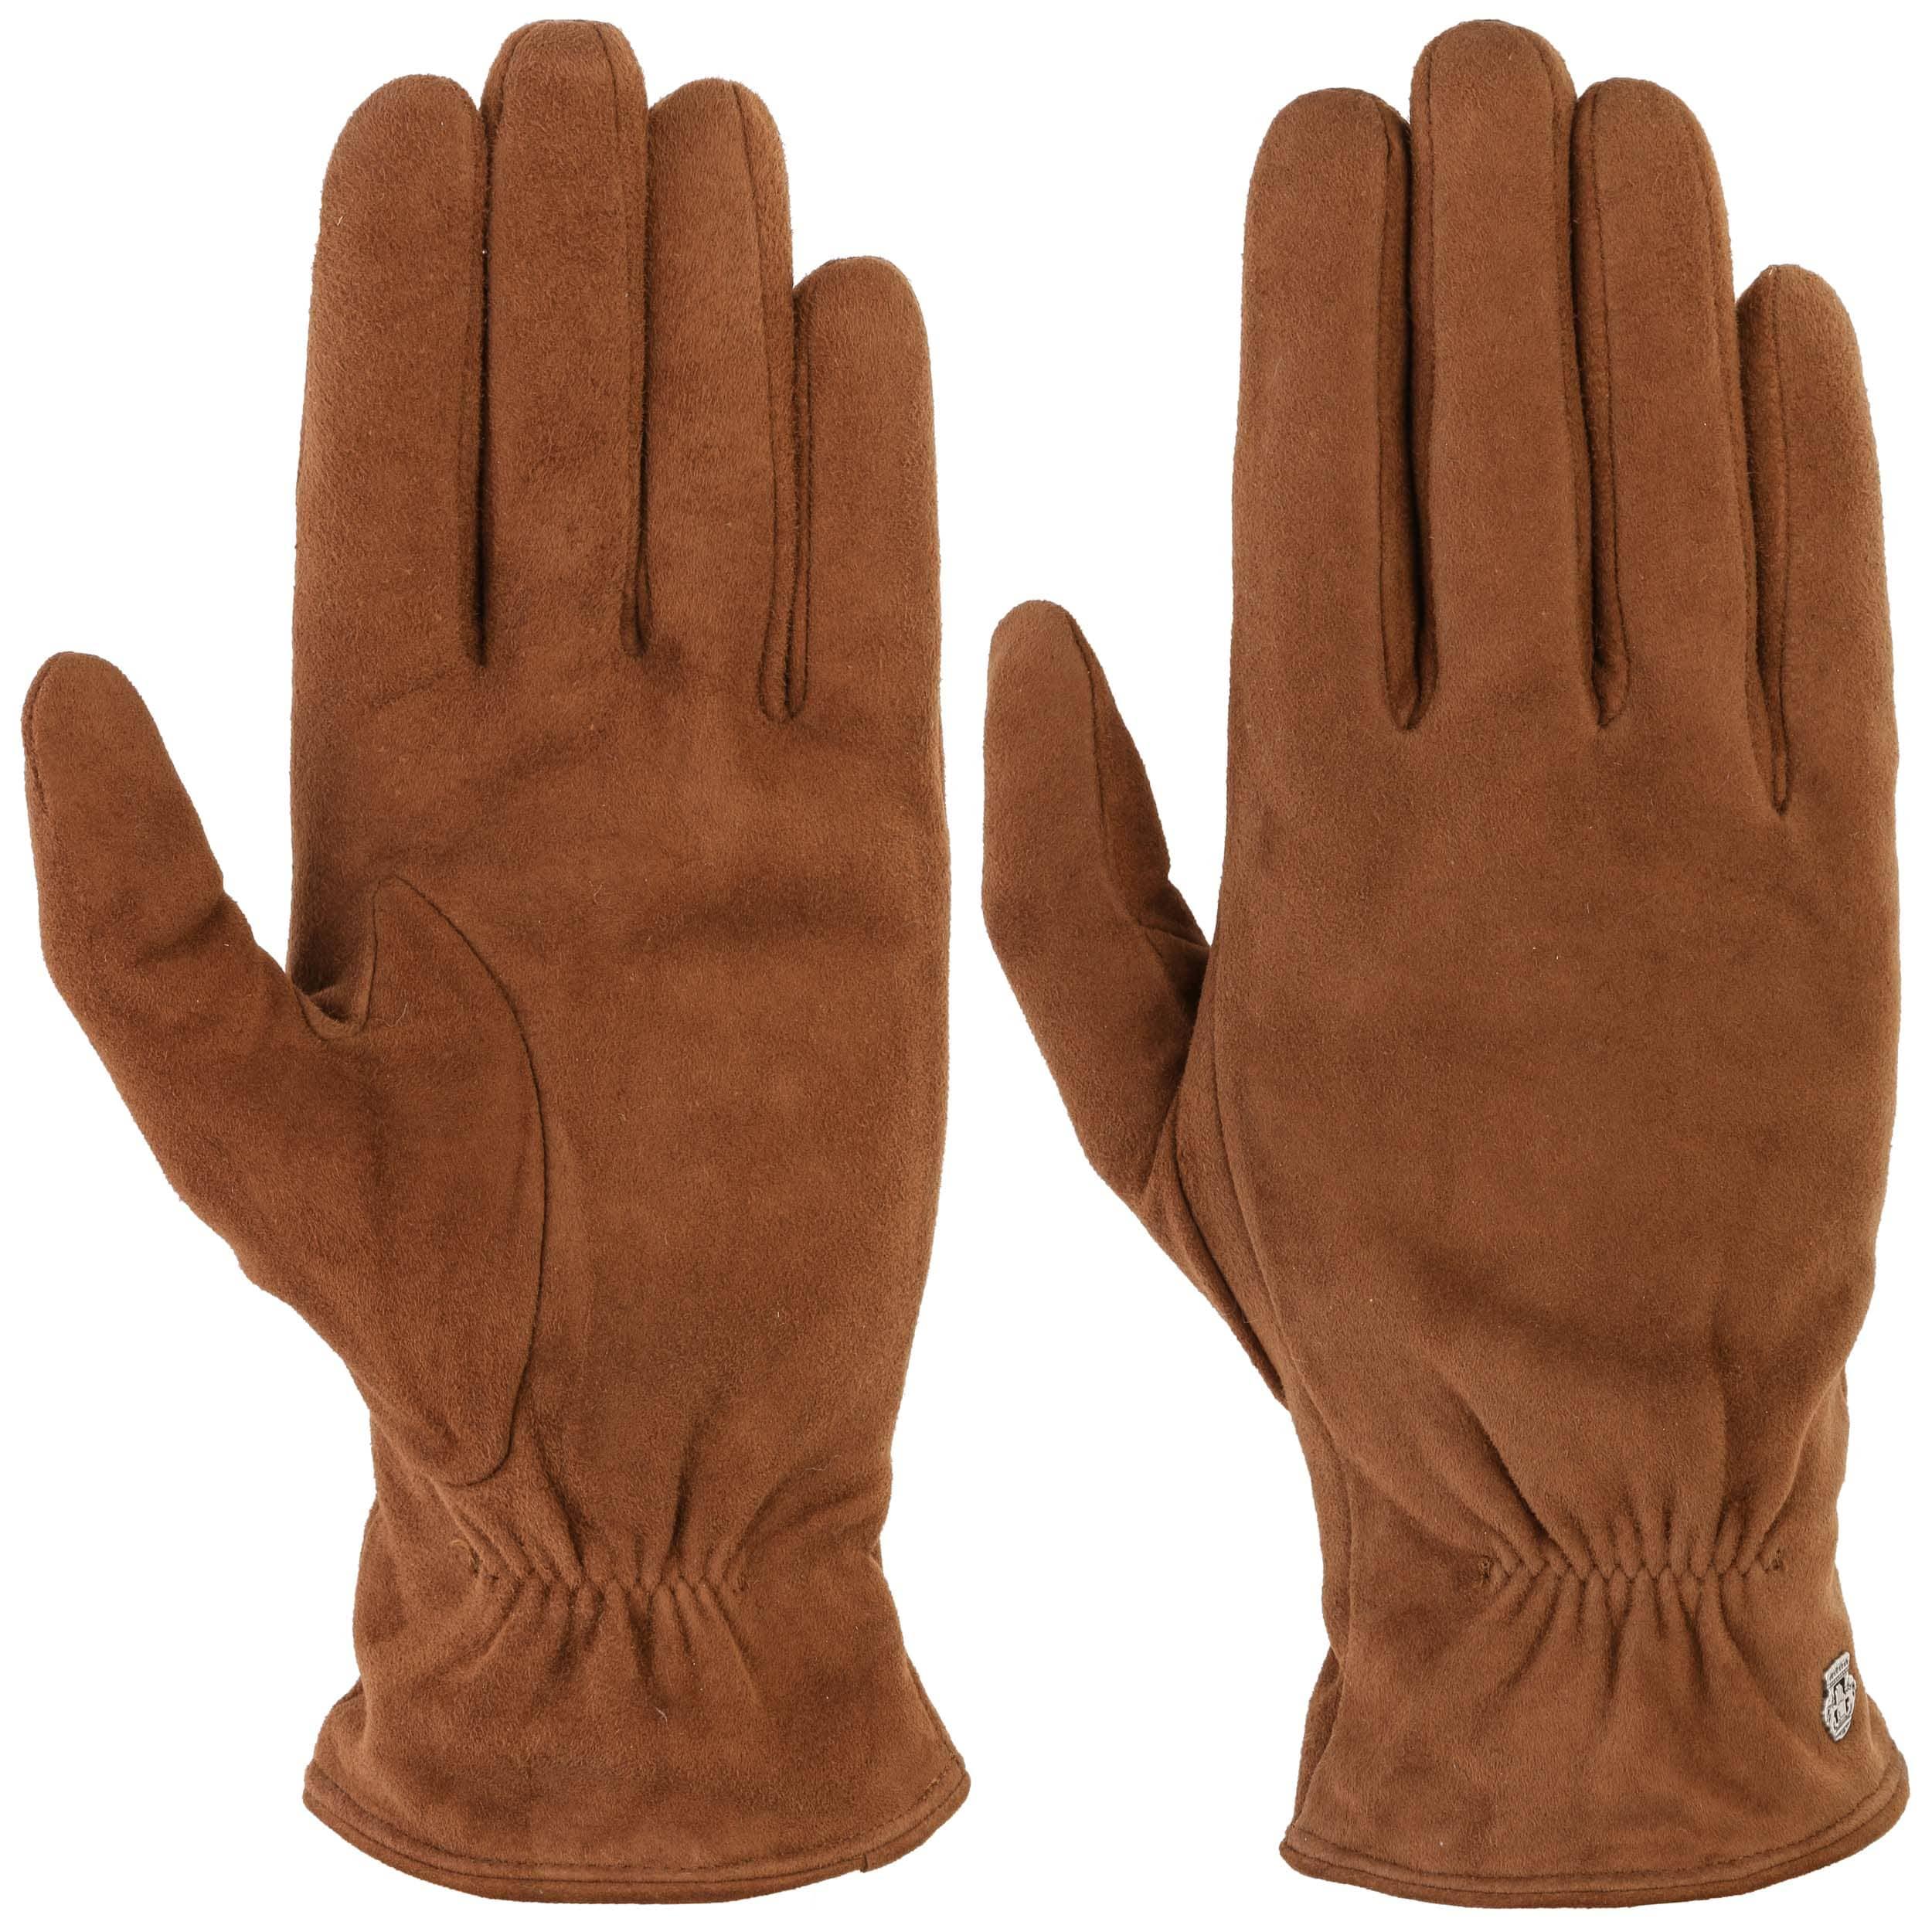 5c730af7ac1f21 ... Classic Veloursleder Handschuhe by Roeckl - schwarz 2